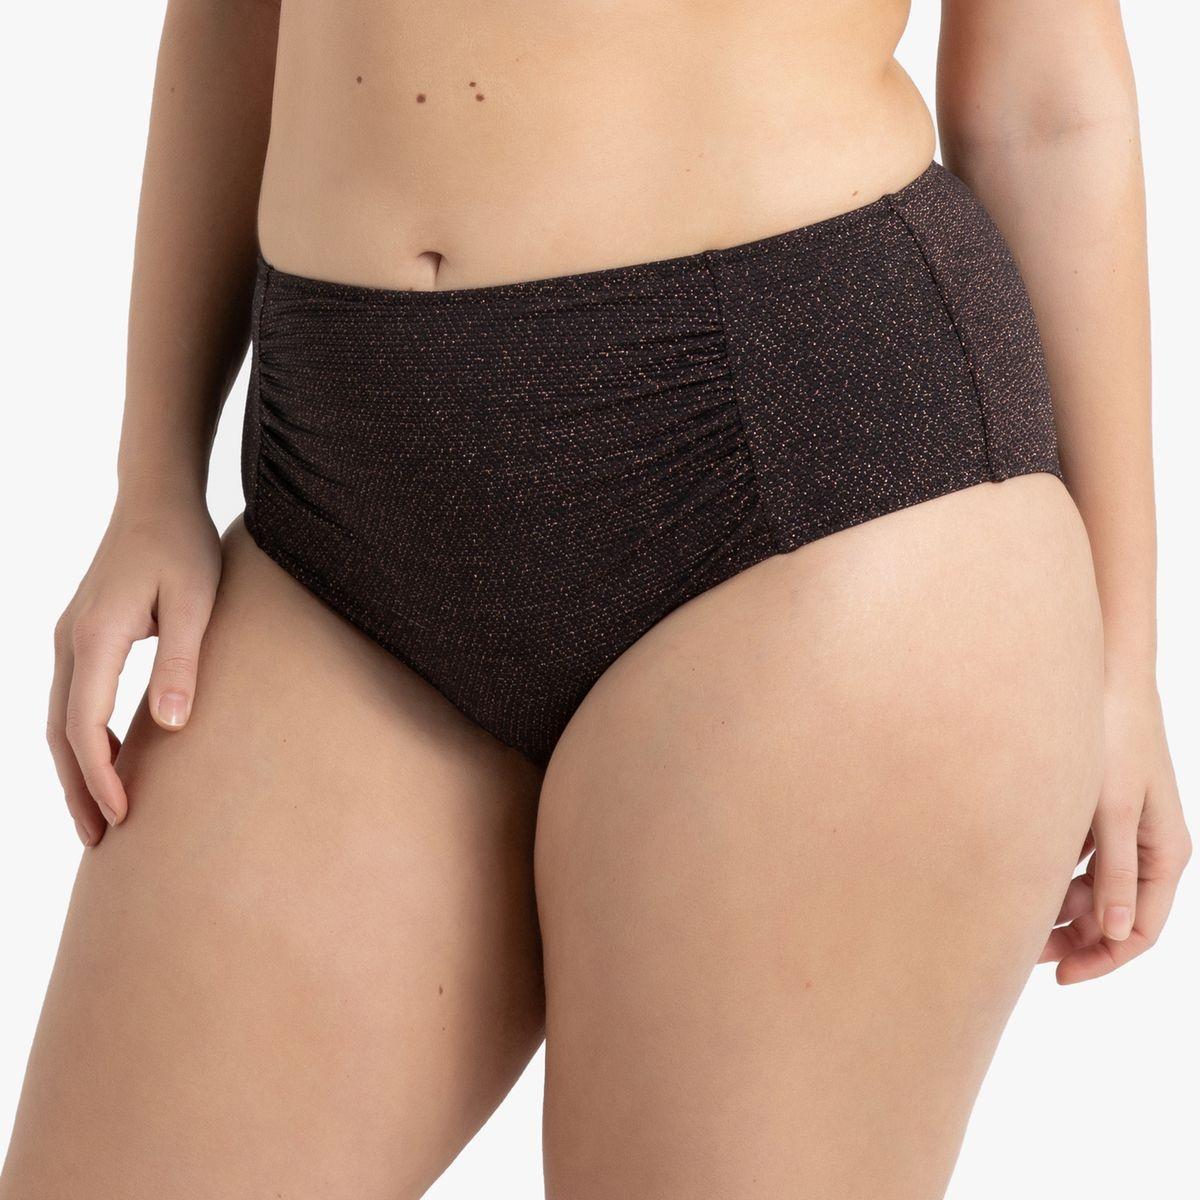 Bas de maillot de bain culotte effet ventre plat